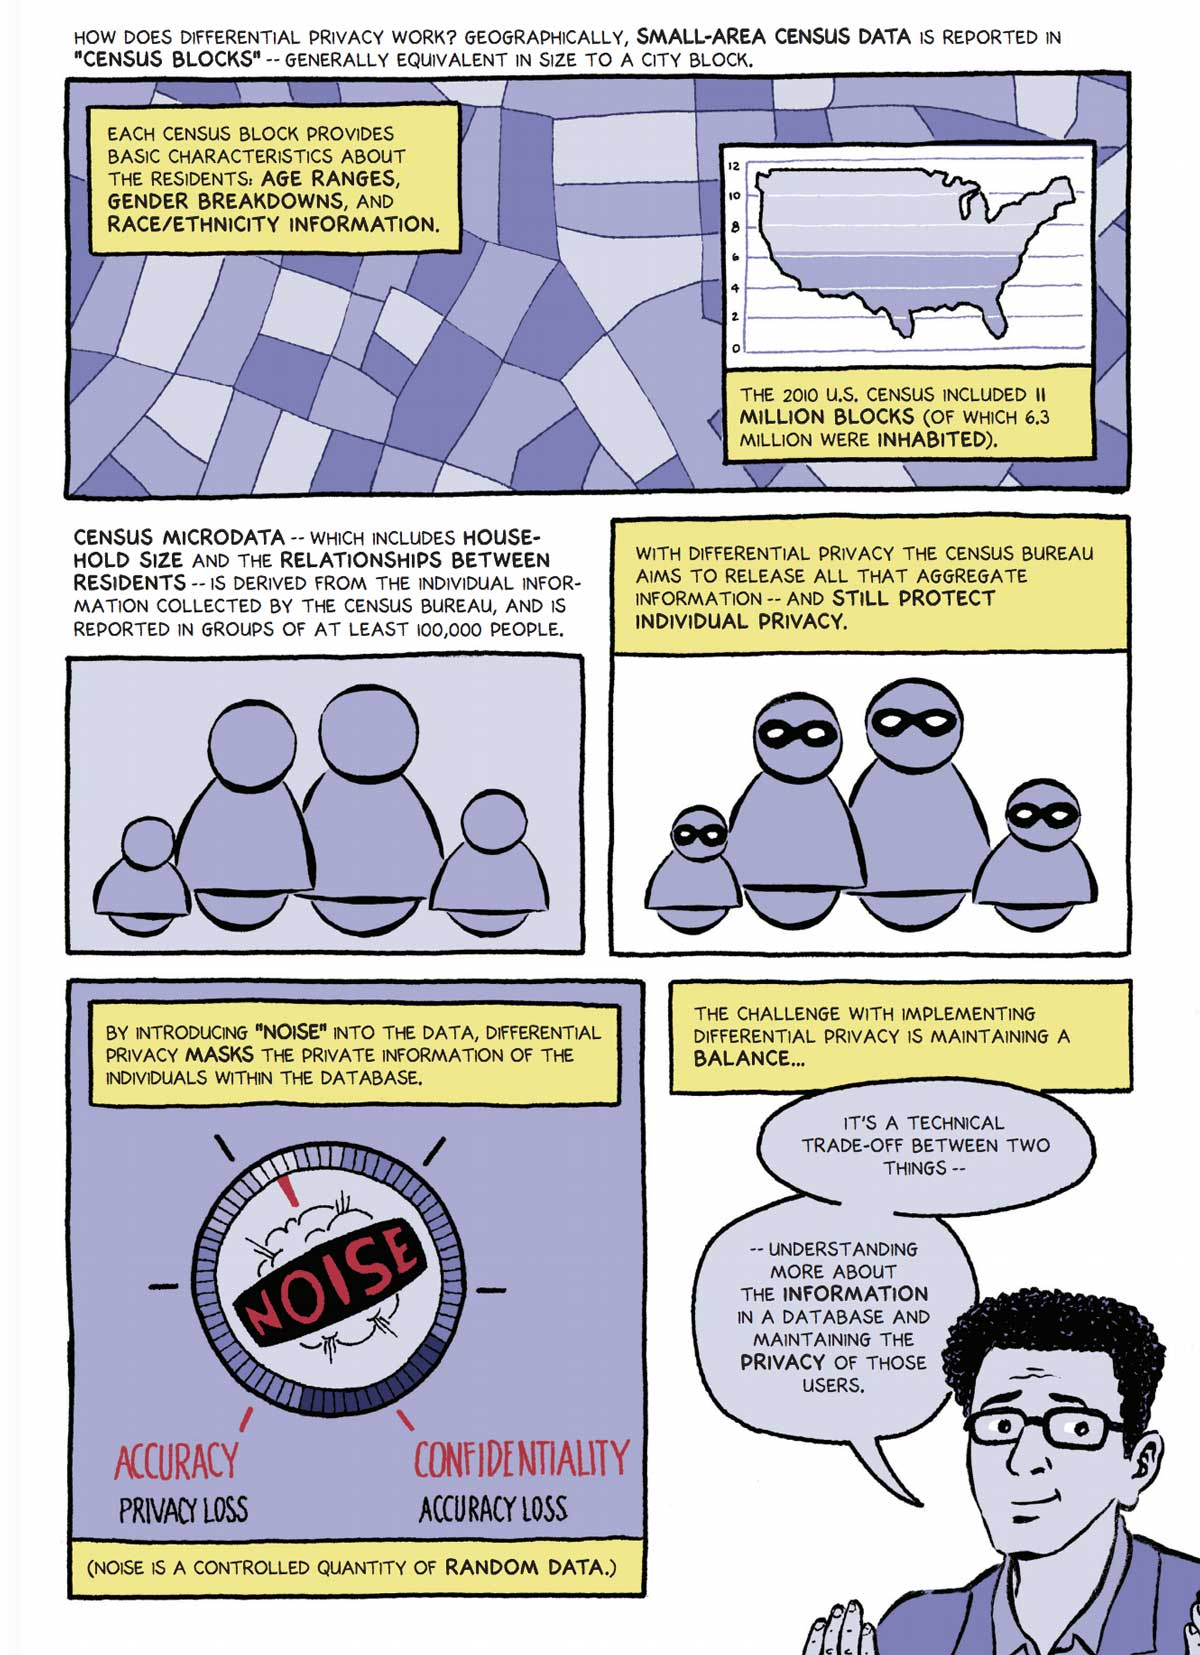 differential privacy explainer 2020 census